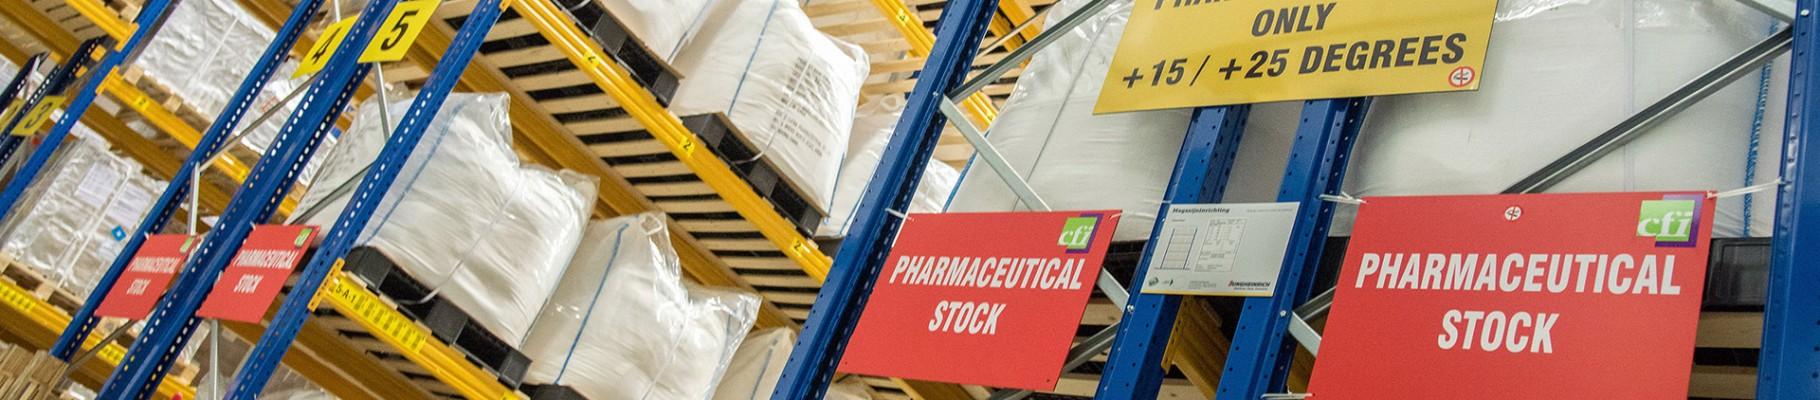 Medicines Storage opslag-geneemiddelen-pharma_logistics_cyberfreight